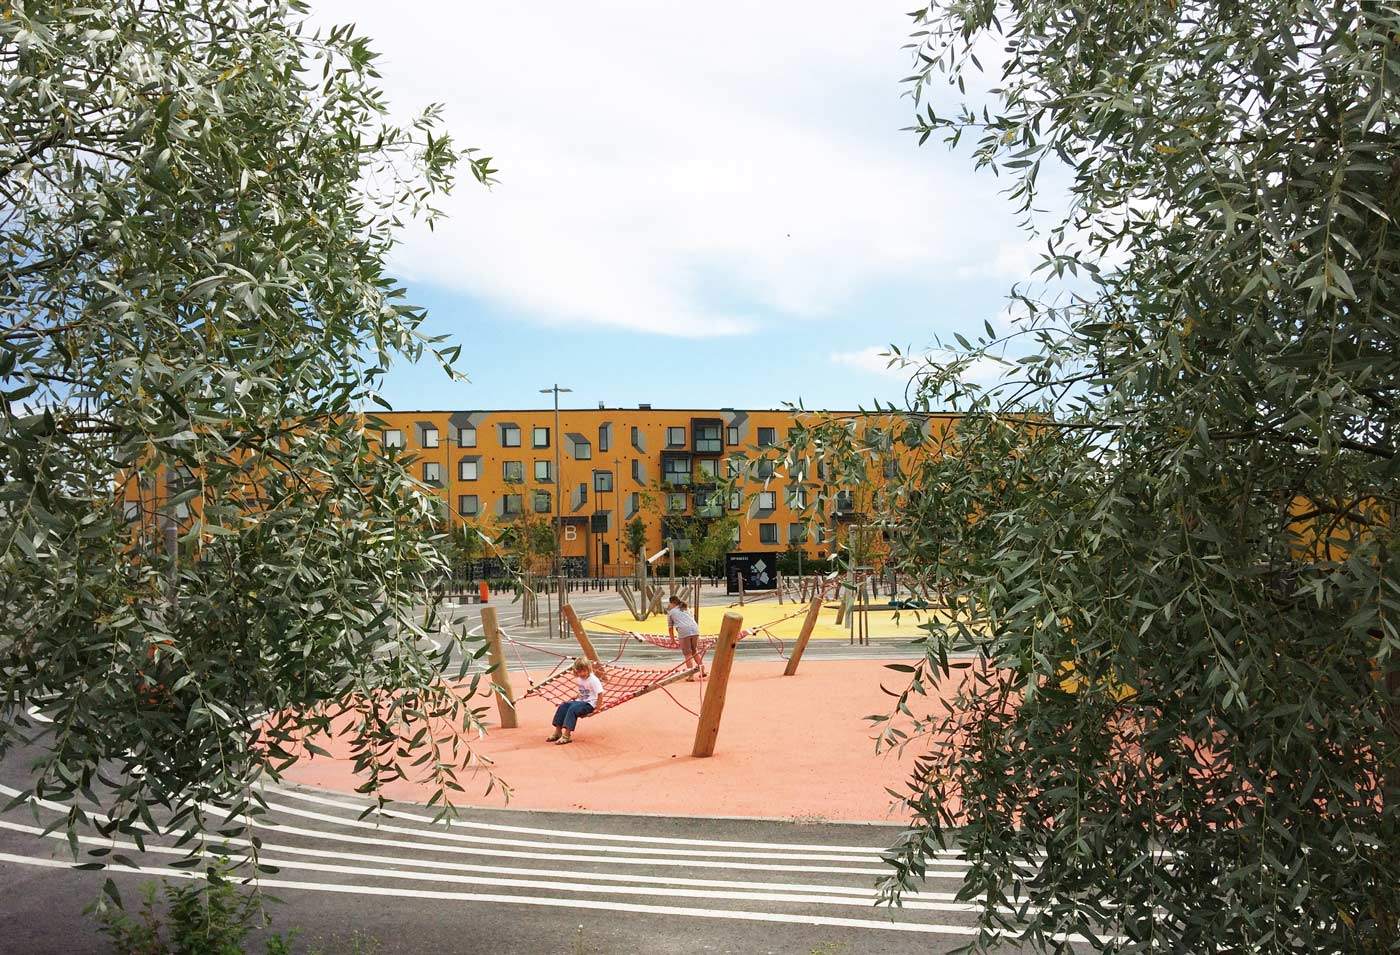 Opinmäki Campus playground